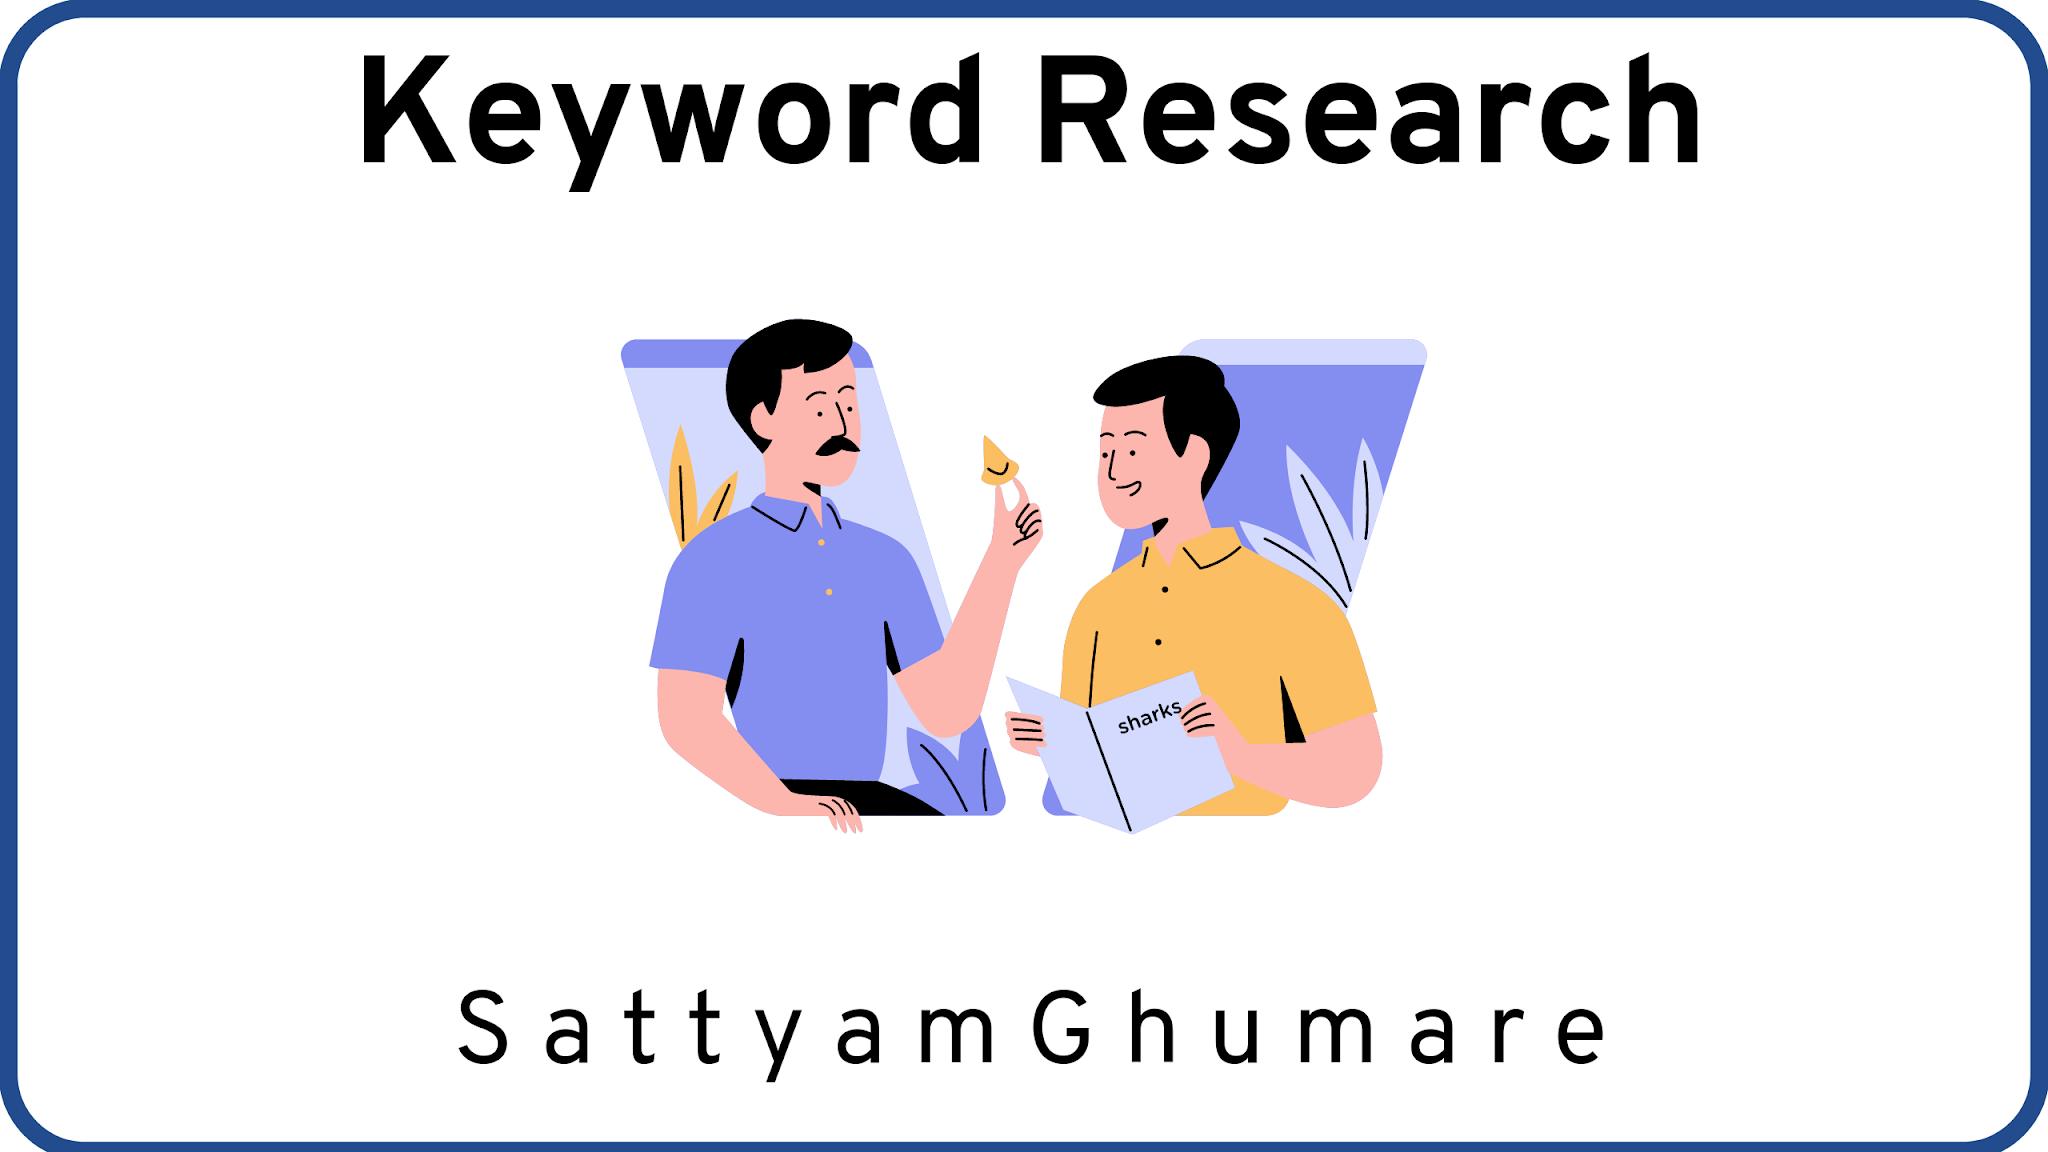 Keywords Research